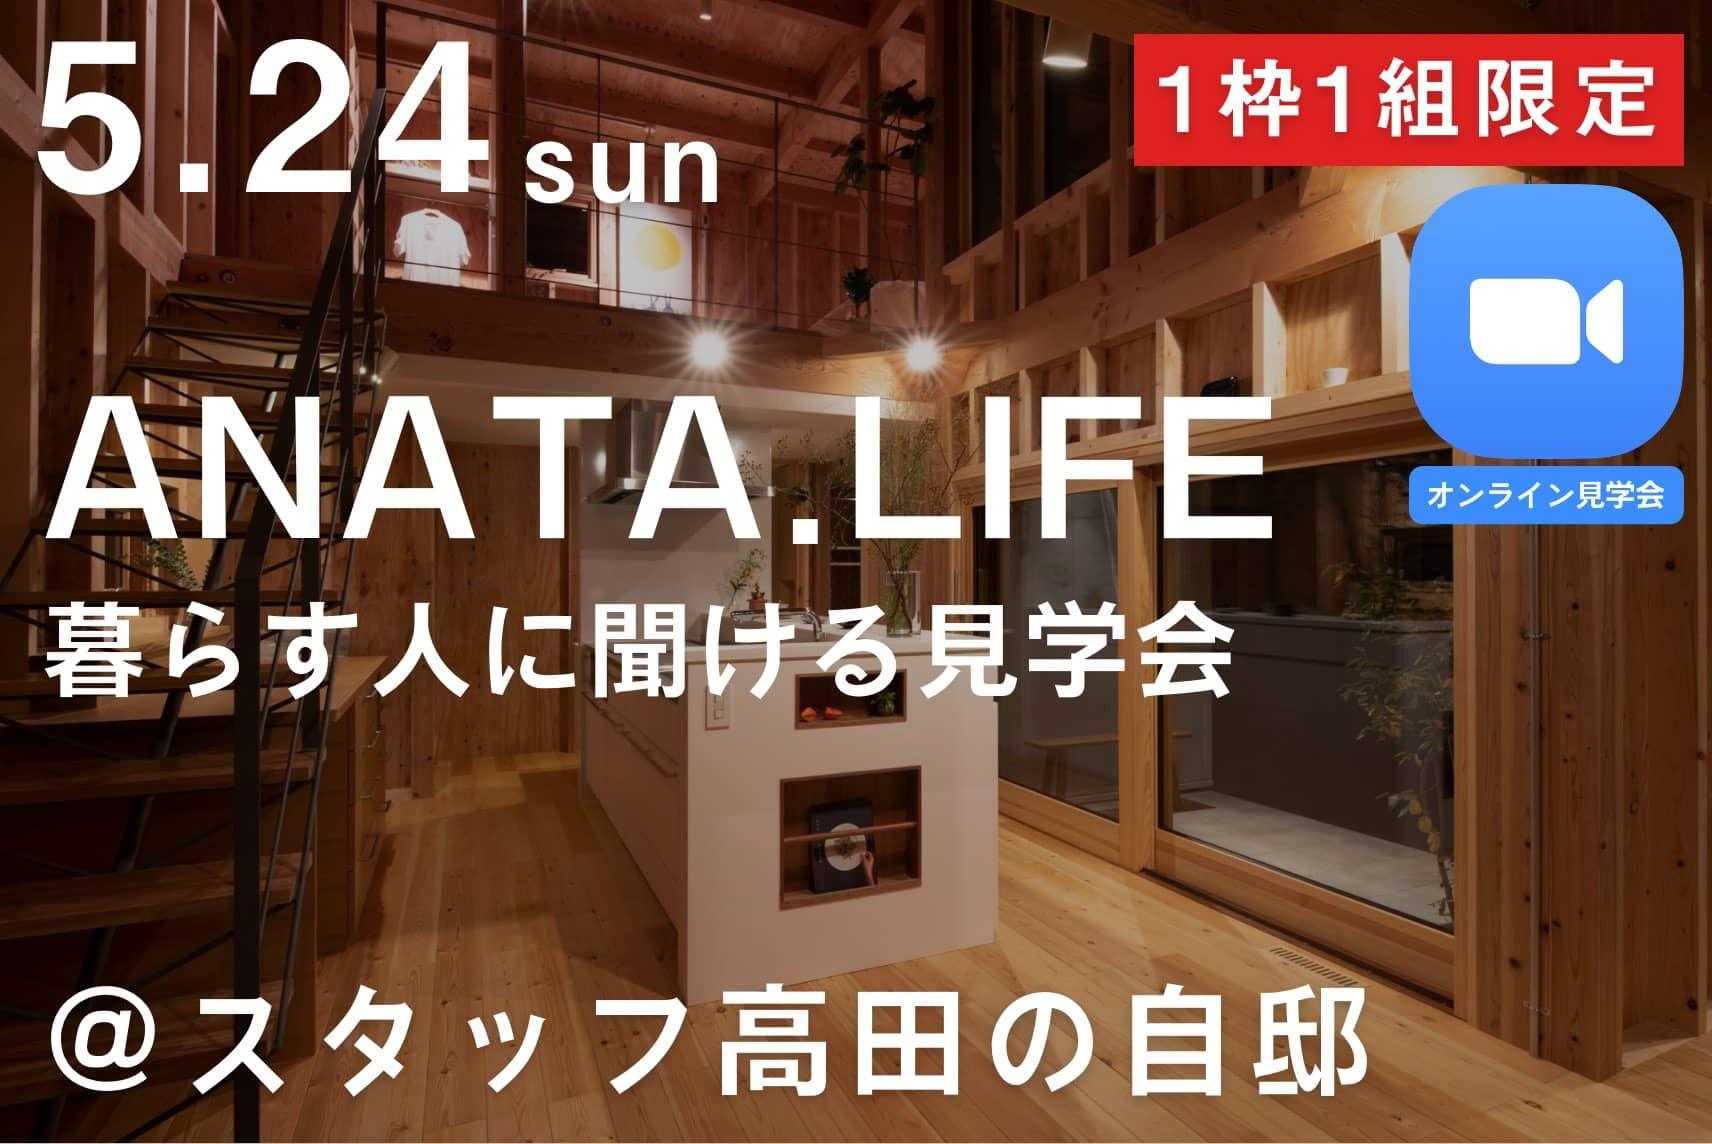 ANATA.LIFE「Plus+」-暮らす人にきける見学会-